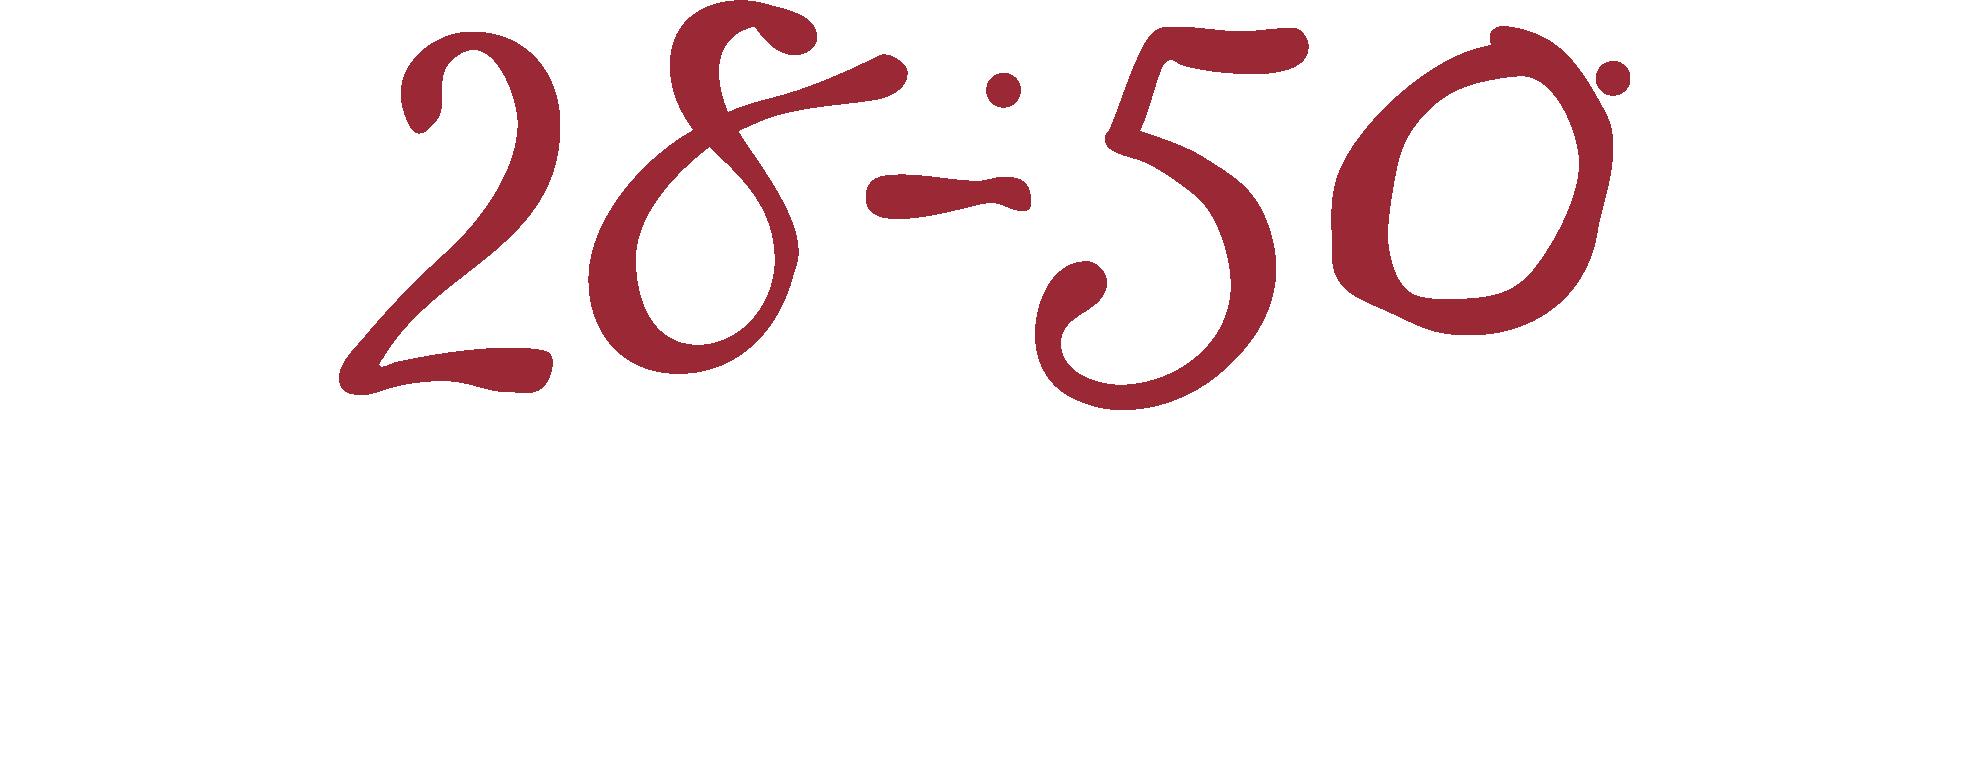 28-50 South Kensington